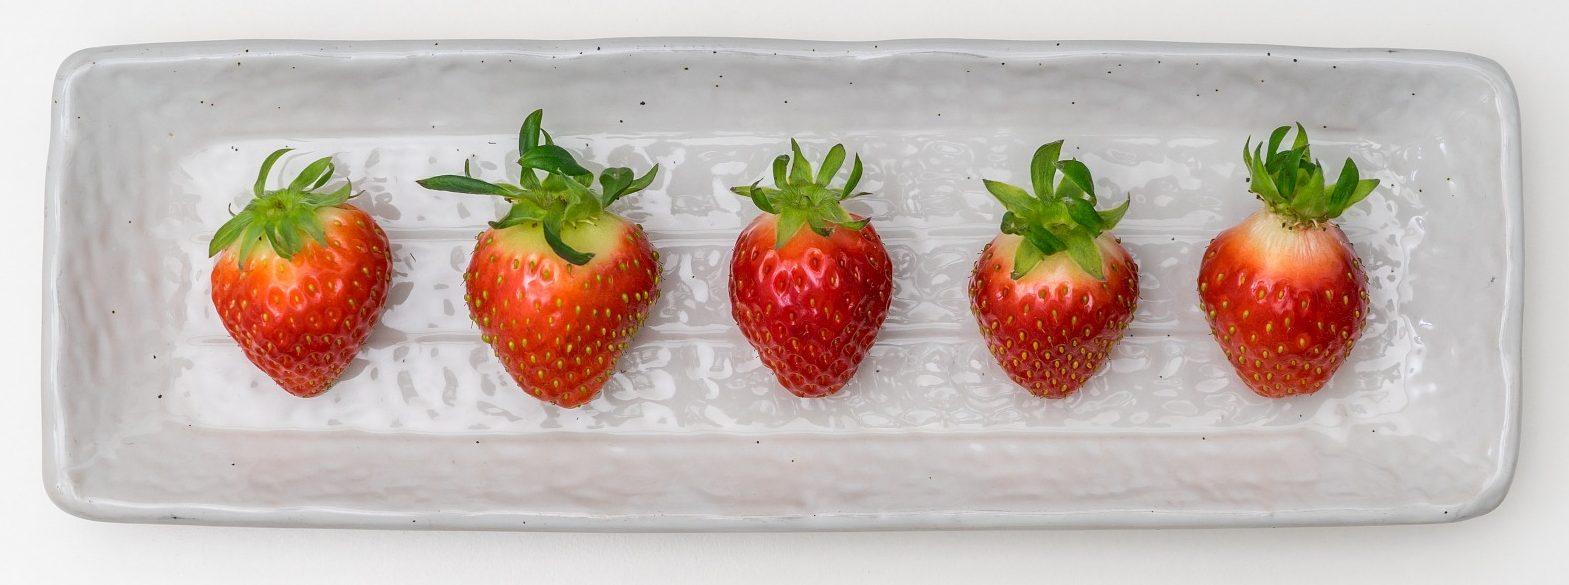 strawberry-1260669_1920